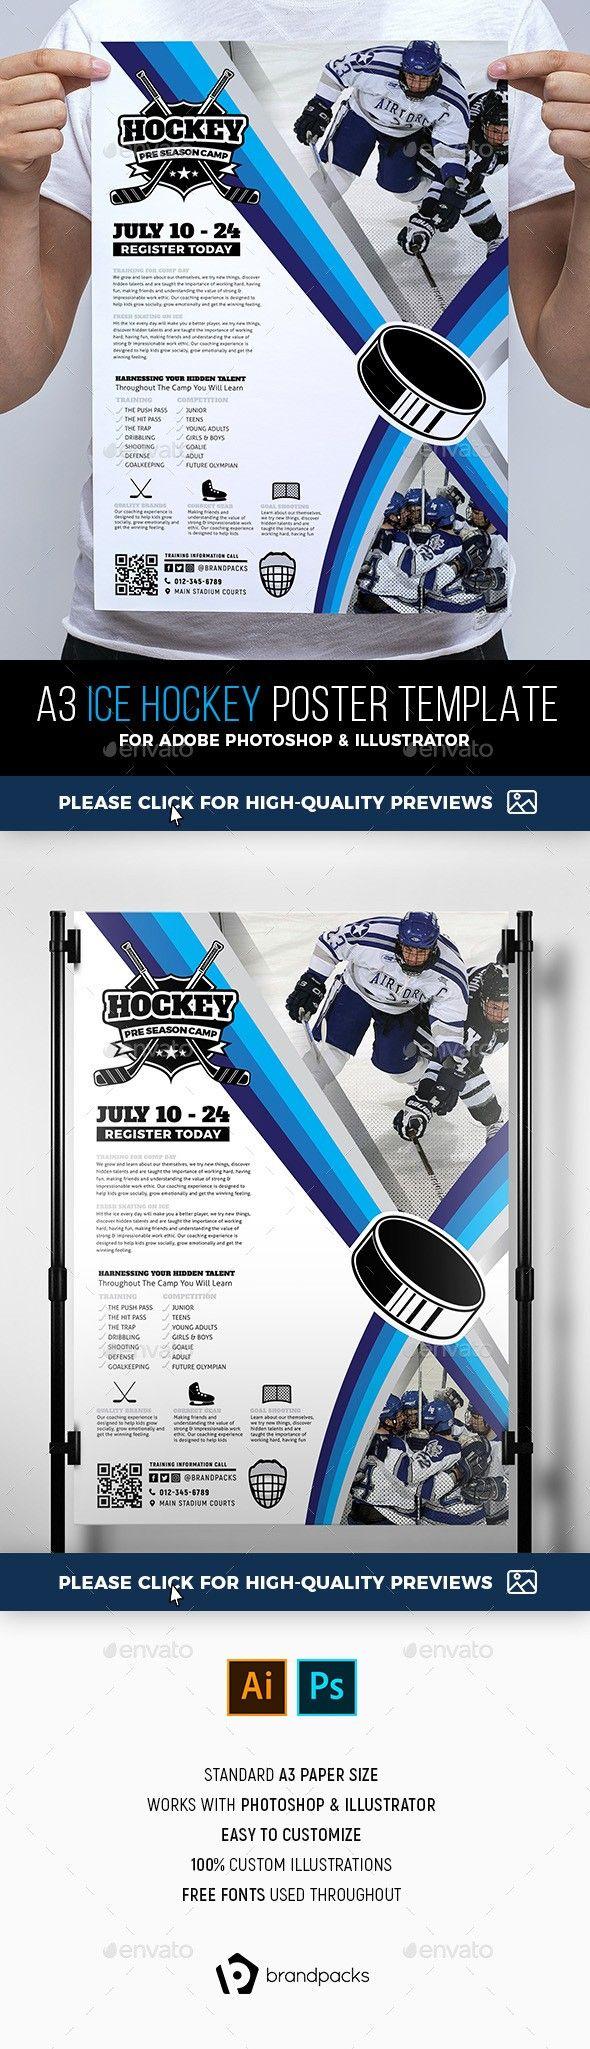 A4 Poster Advert Advertisement Ai Brandpacks College Hockey